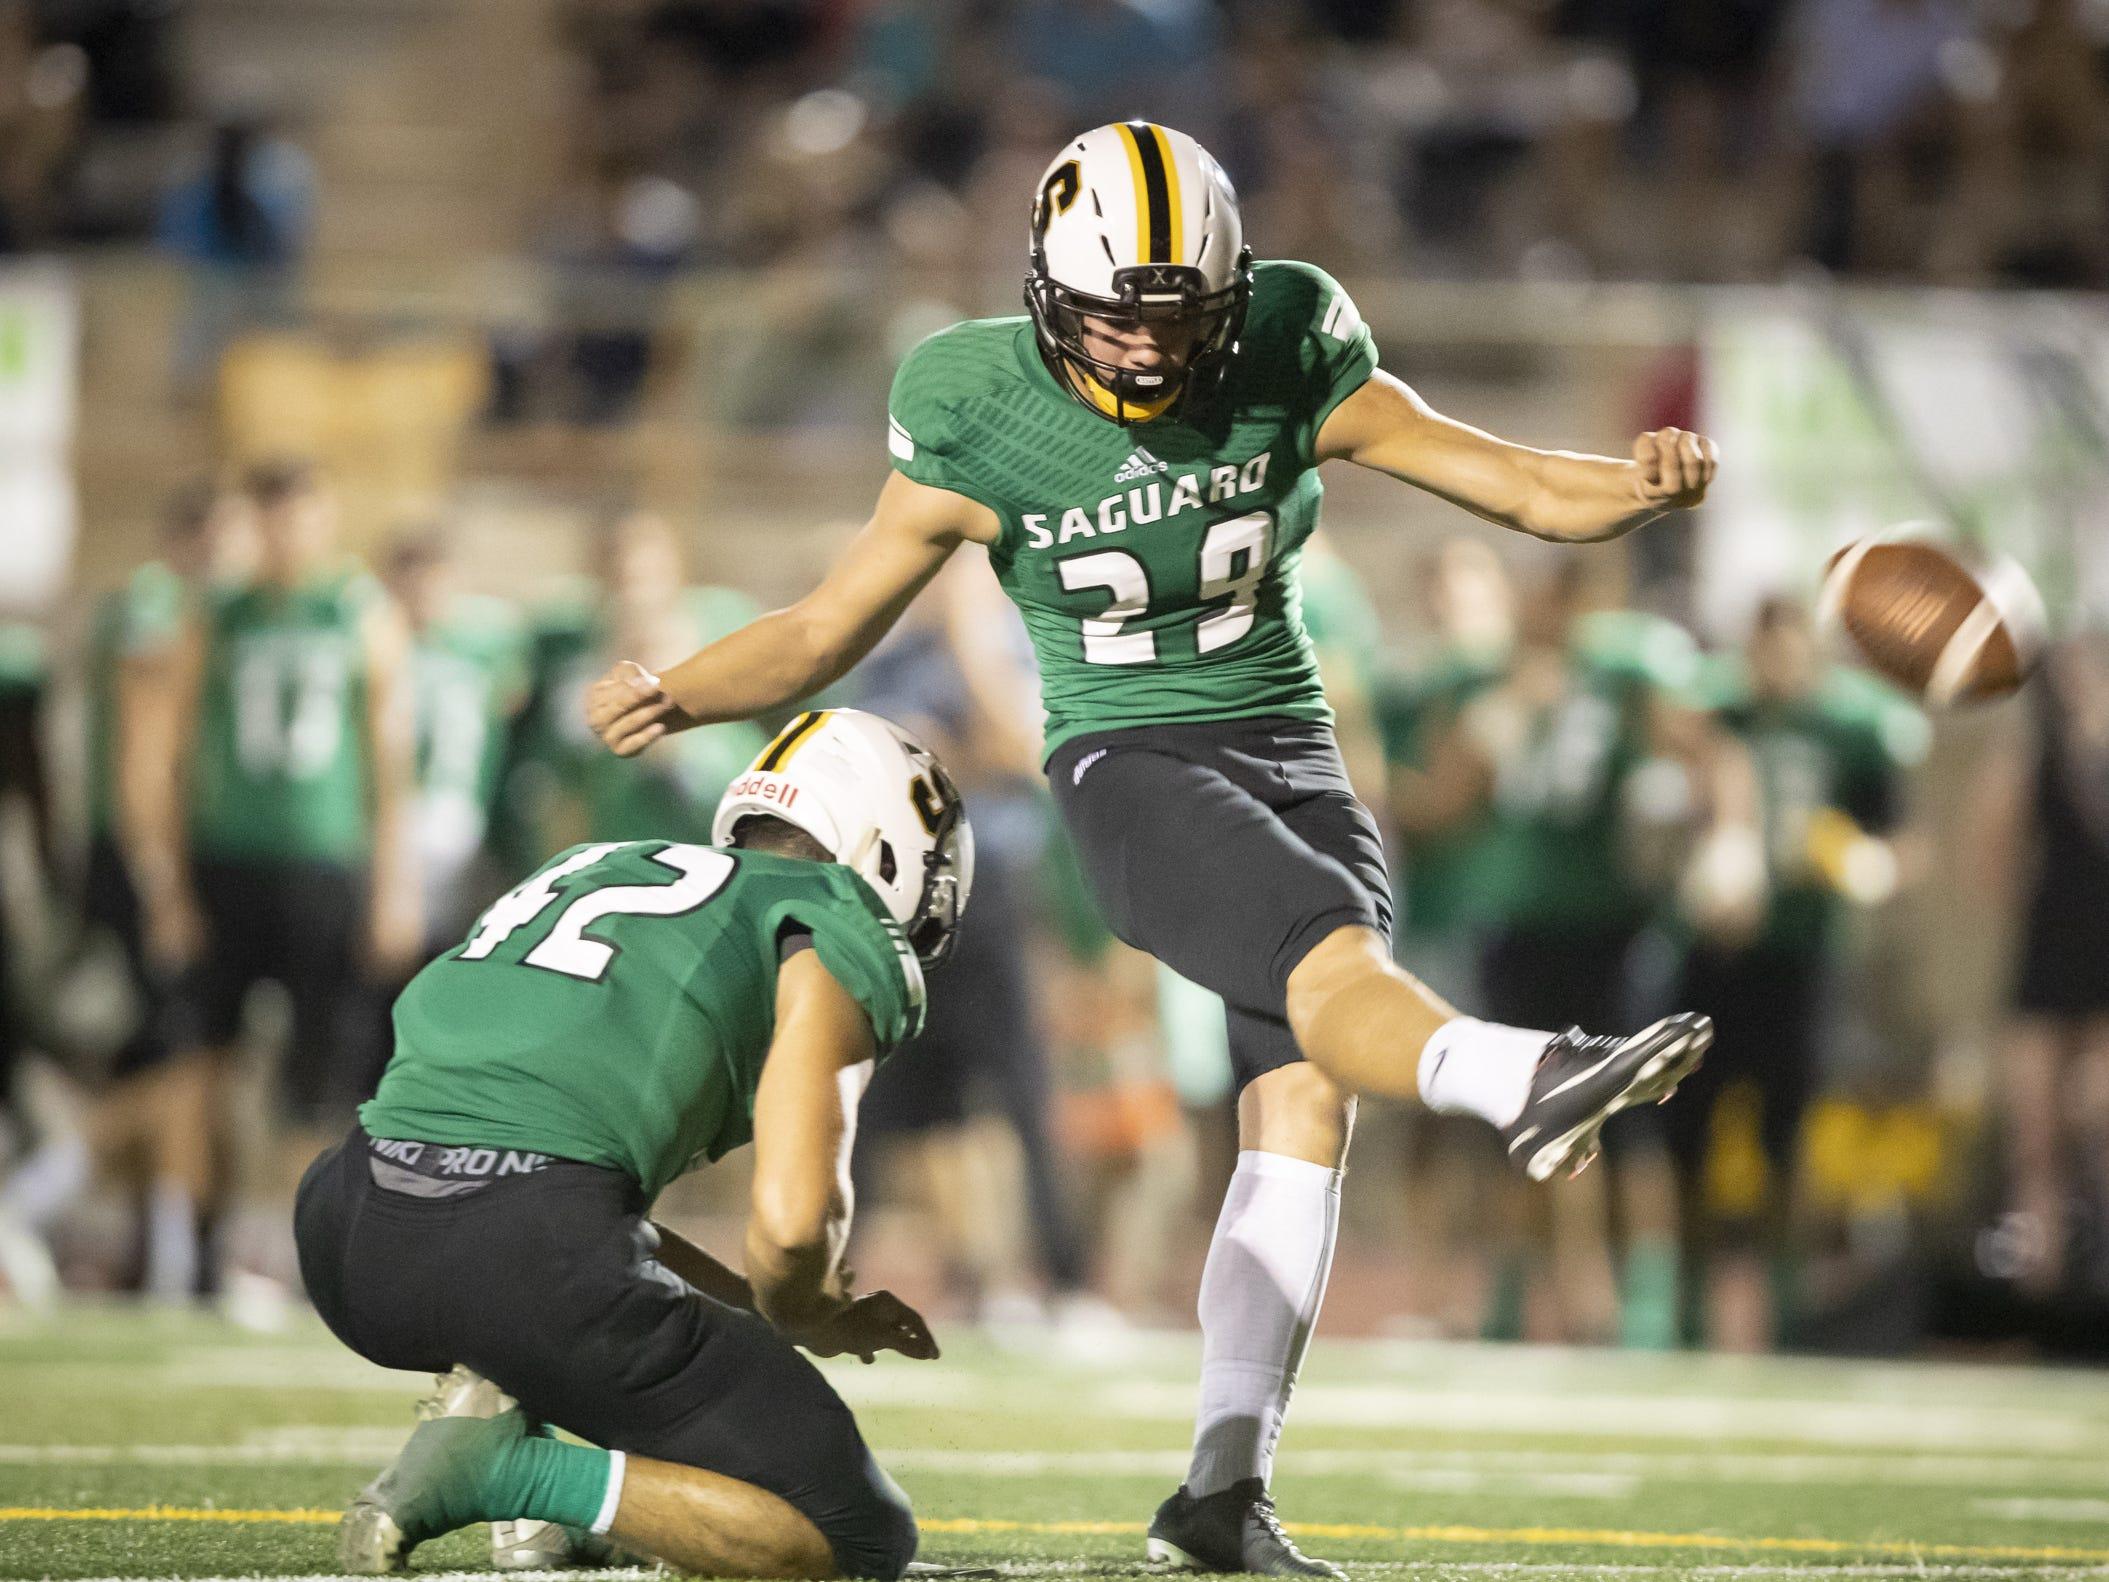 Junior kicker Parker Lewis (29) of the Saguaro Sabercats kicks an extra point against the Desert Edge Scorpions at Saguaro High School on Friday, September 28, 2018 in Scottsdale, Arizona. #azhsfb